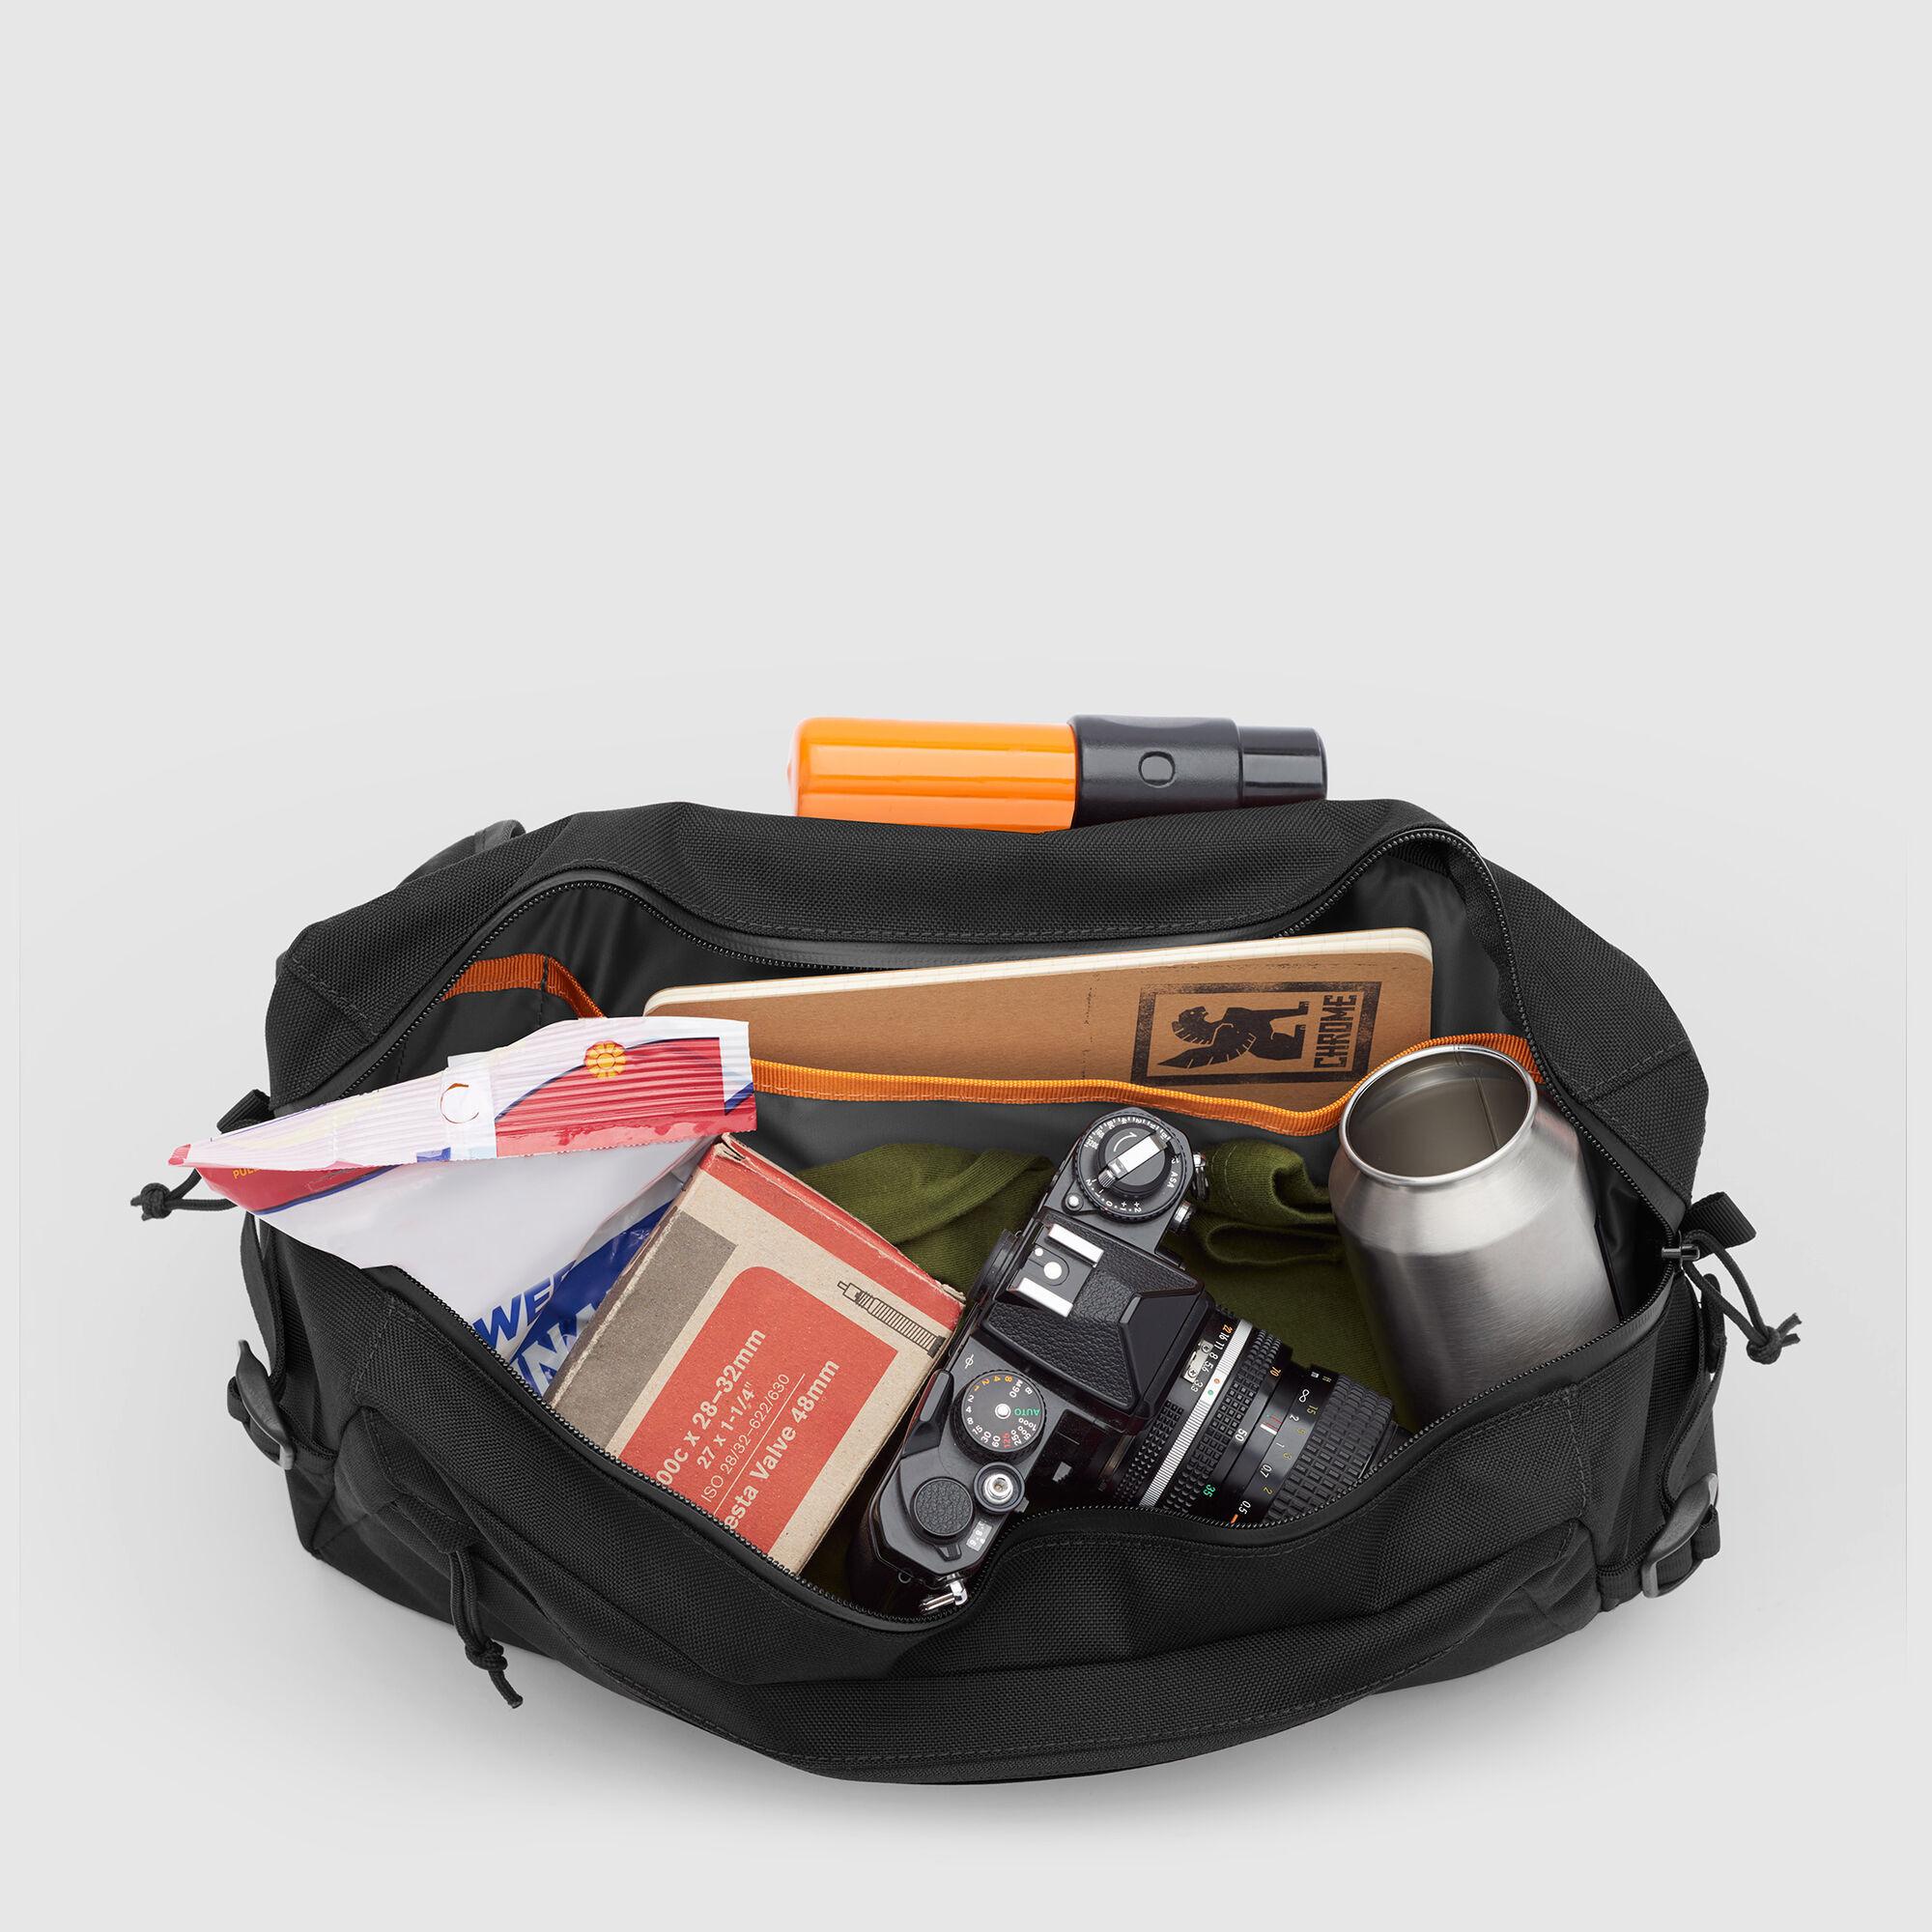 Kadet Nylon Messenger Bag - A Bag Built for the City